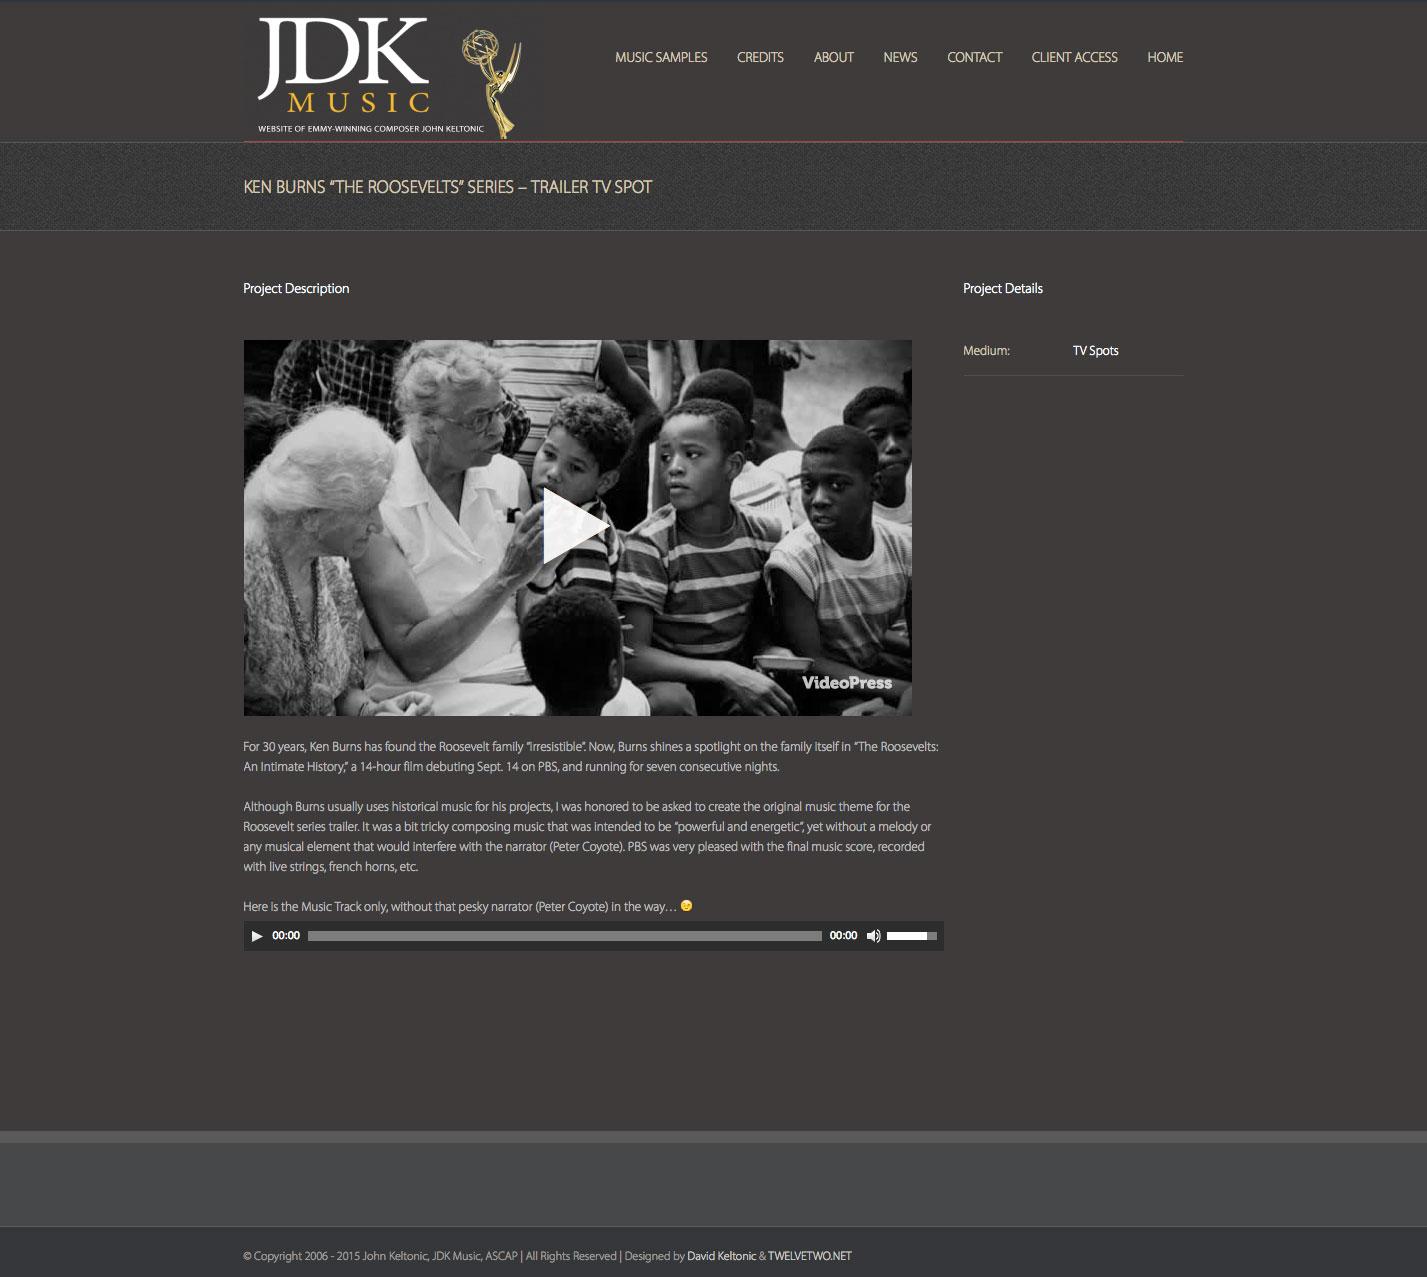 jdk-port-hd-video-stream